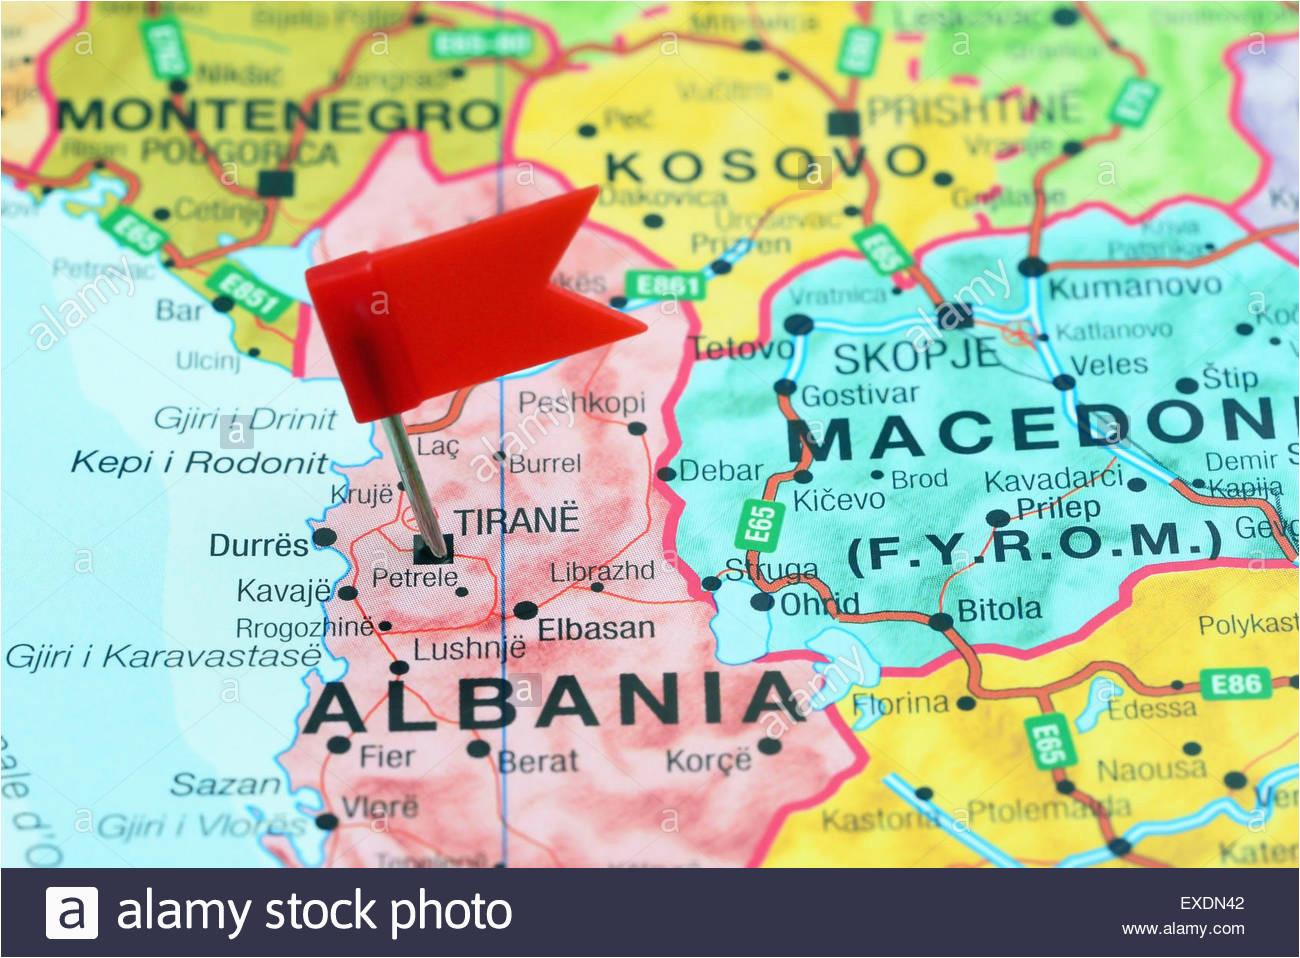 tirane pinned on a map of europe stock photo 85124482 alamy